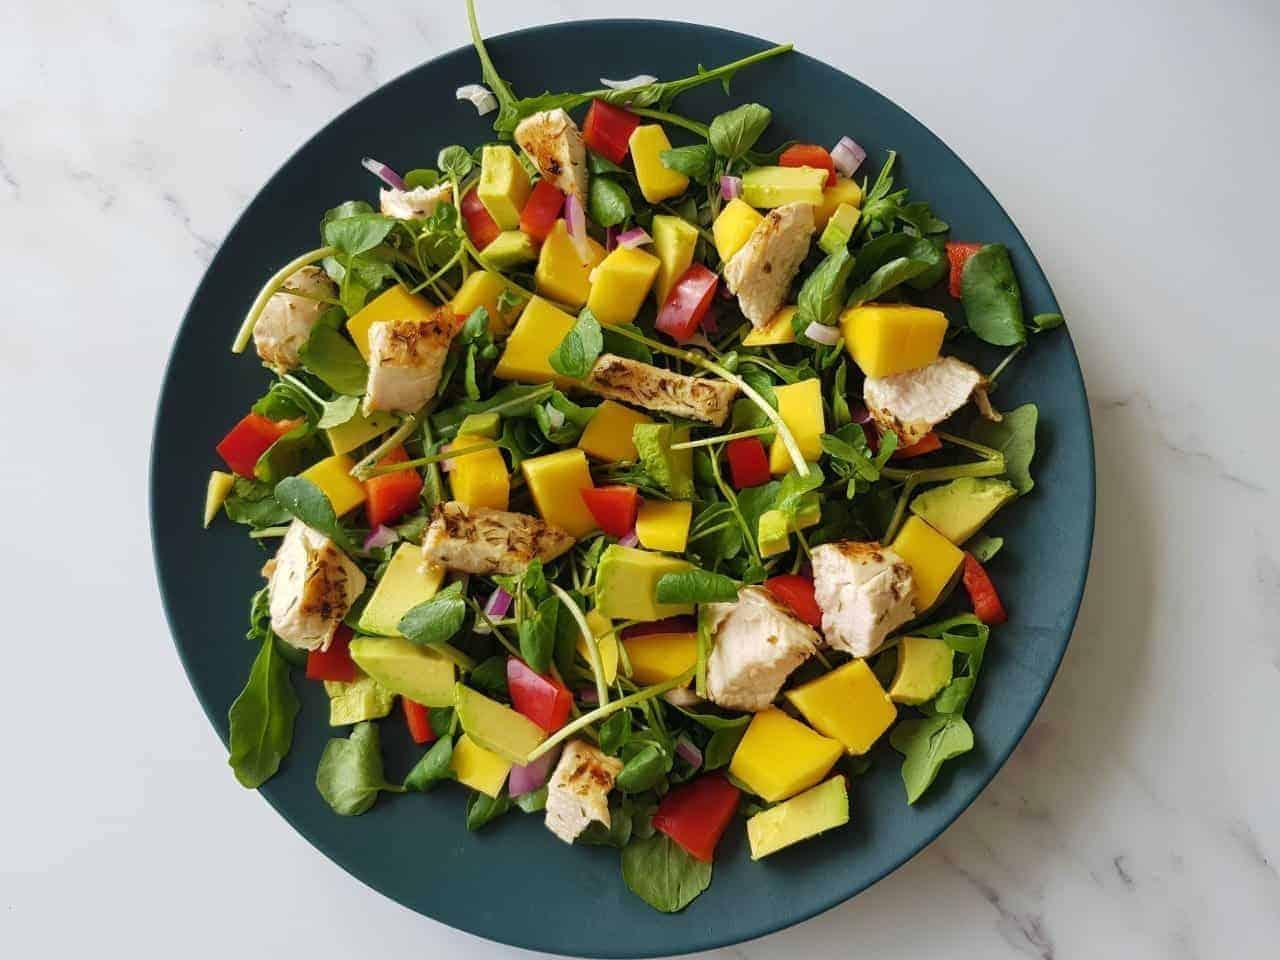 Mango and chicken salad